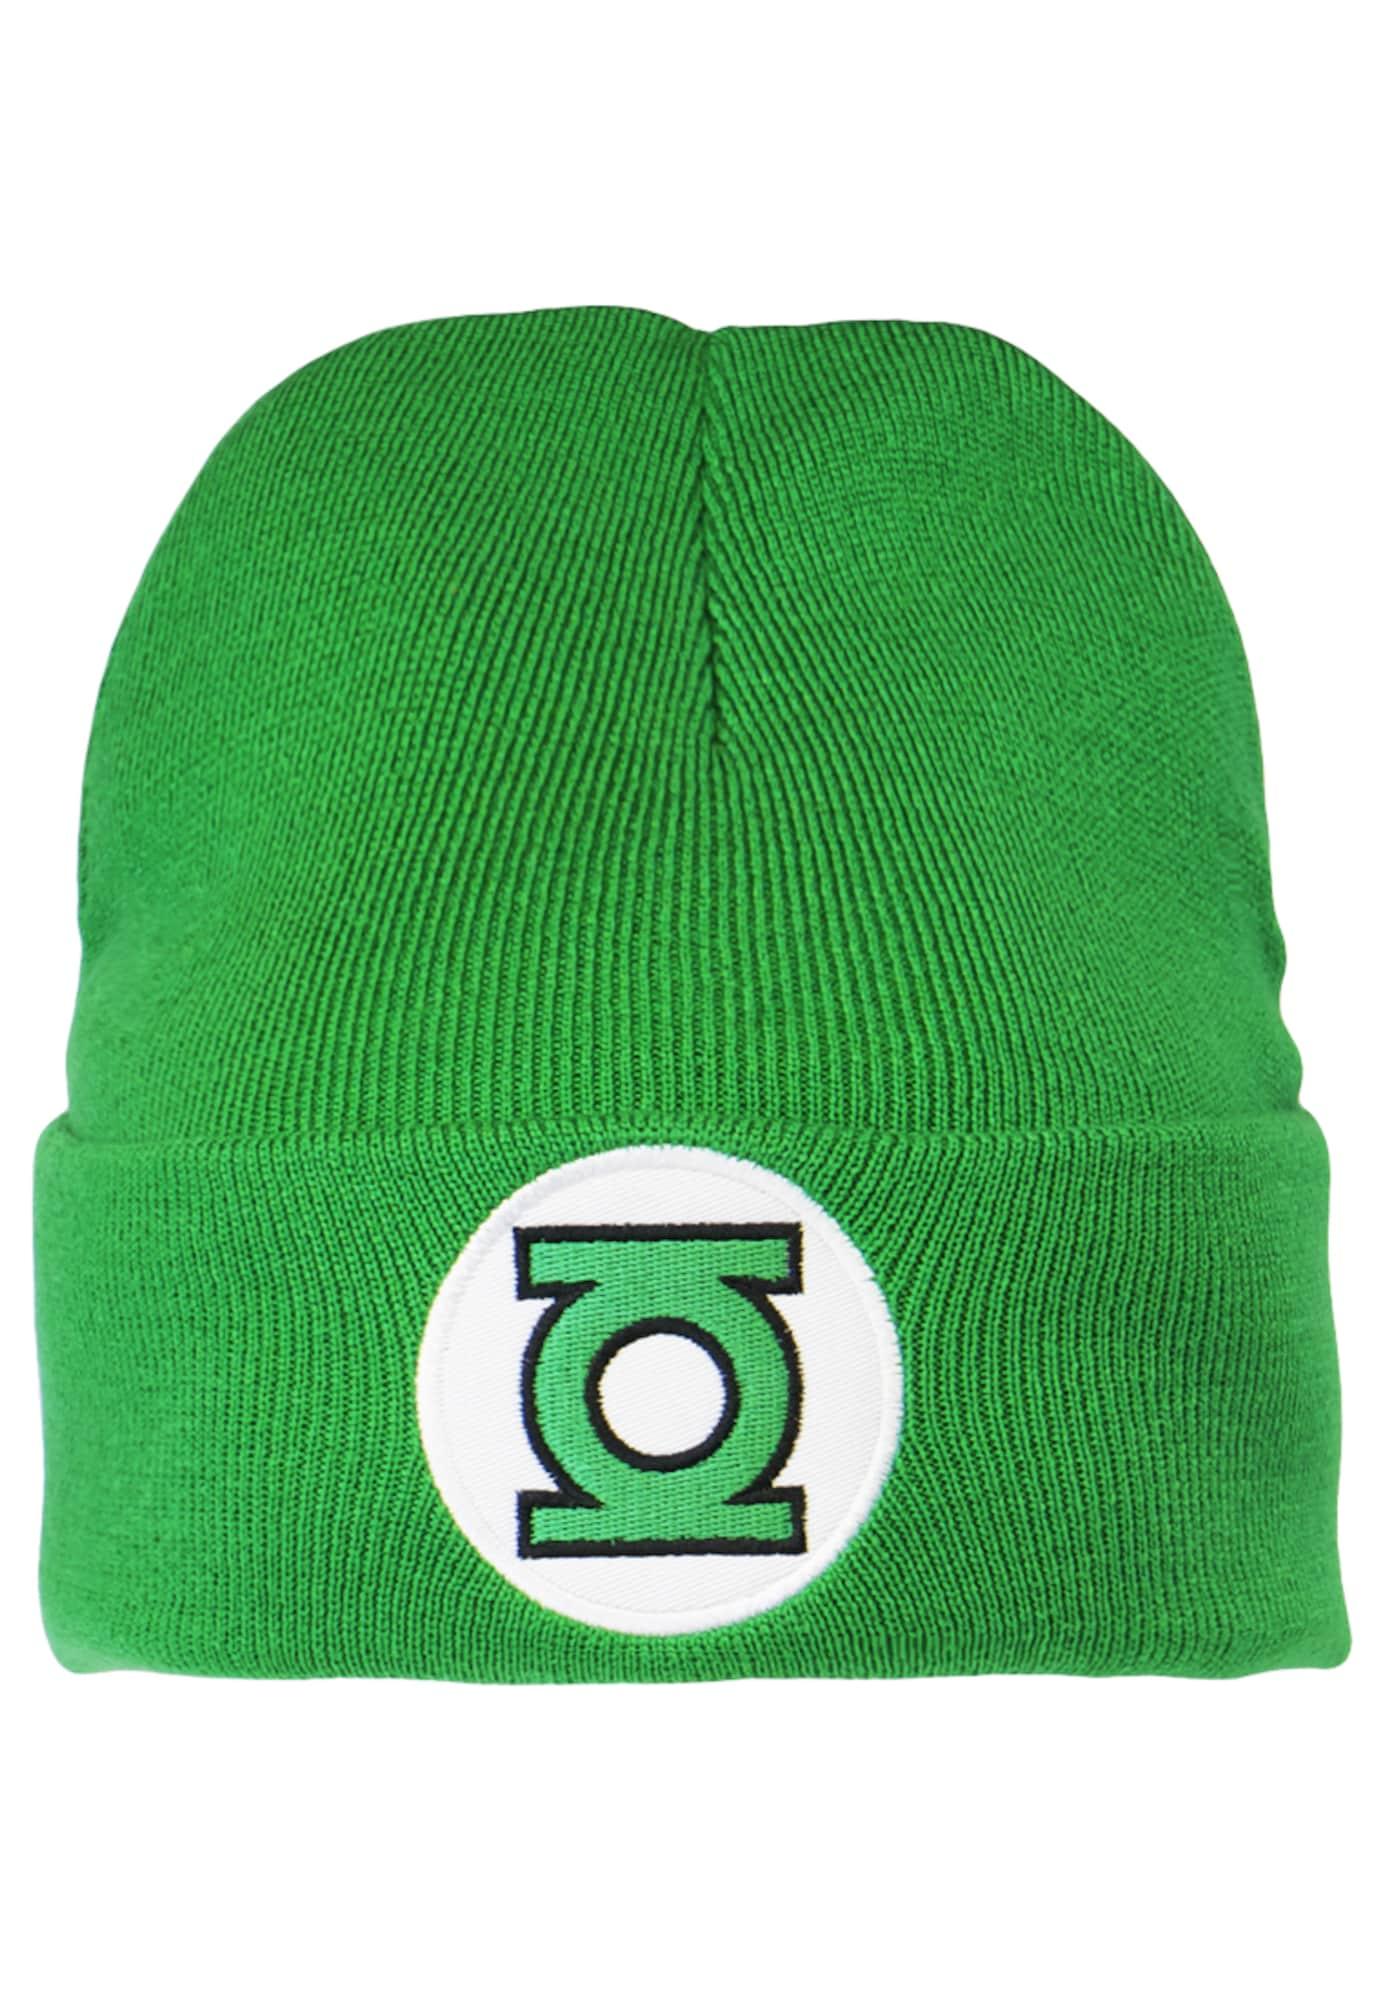 Strickmütze 'Green Lantern – Logo' | Accessoires > Mützen > Strickmützen | Logoshirt